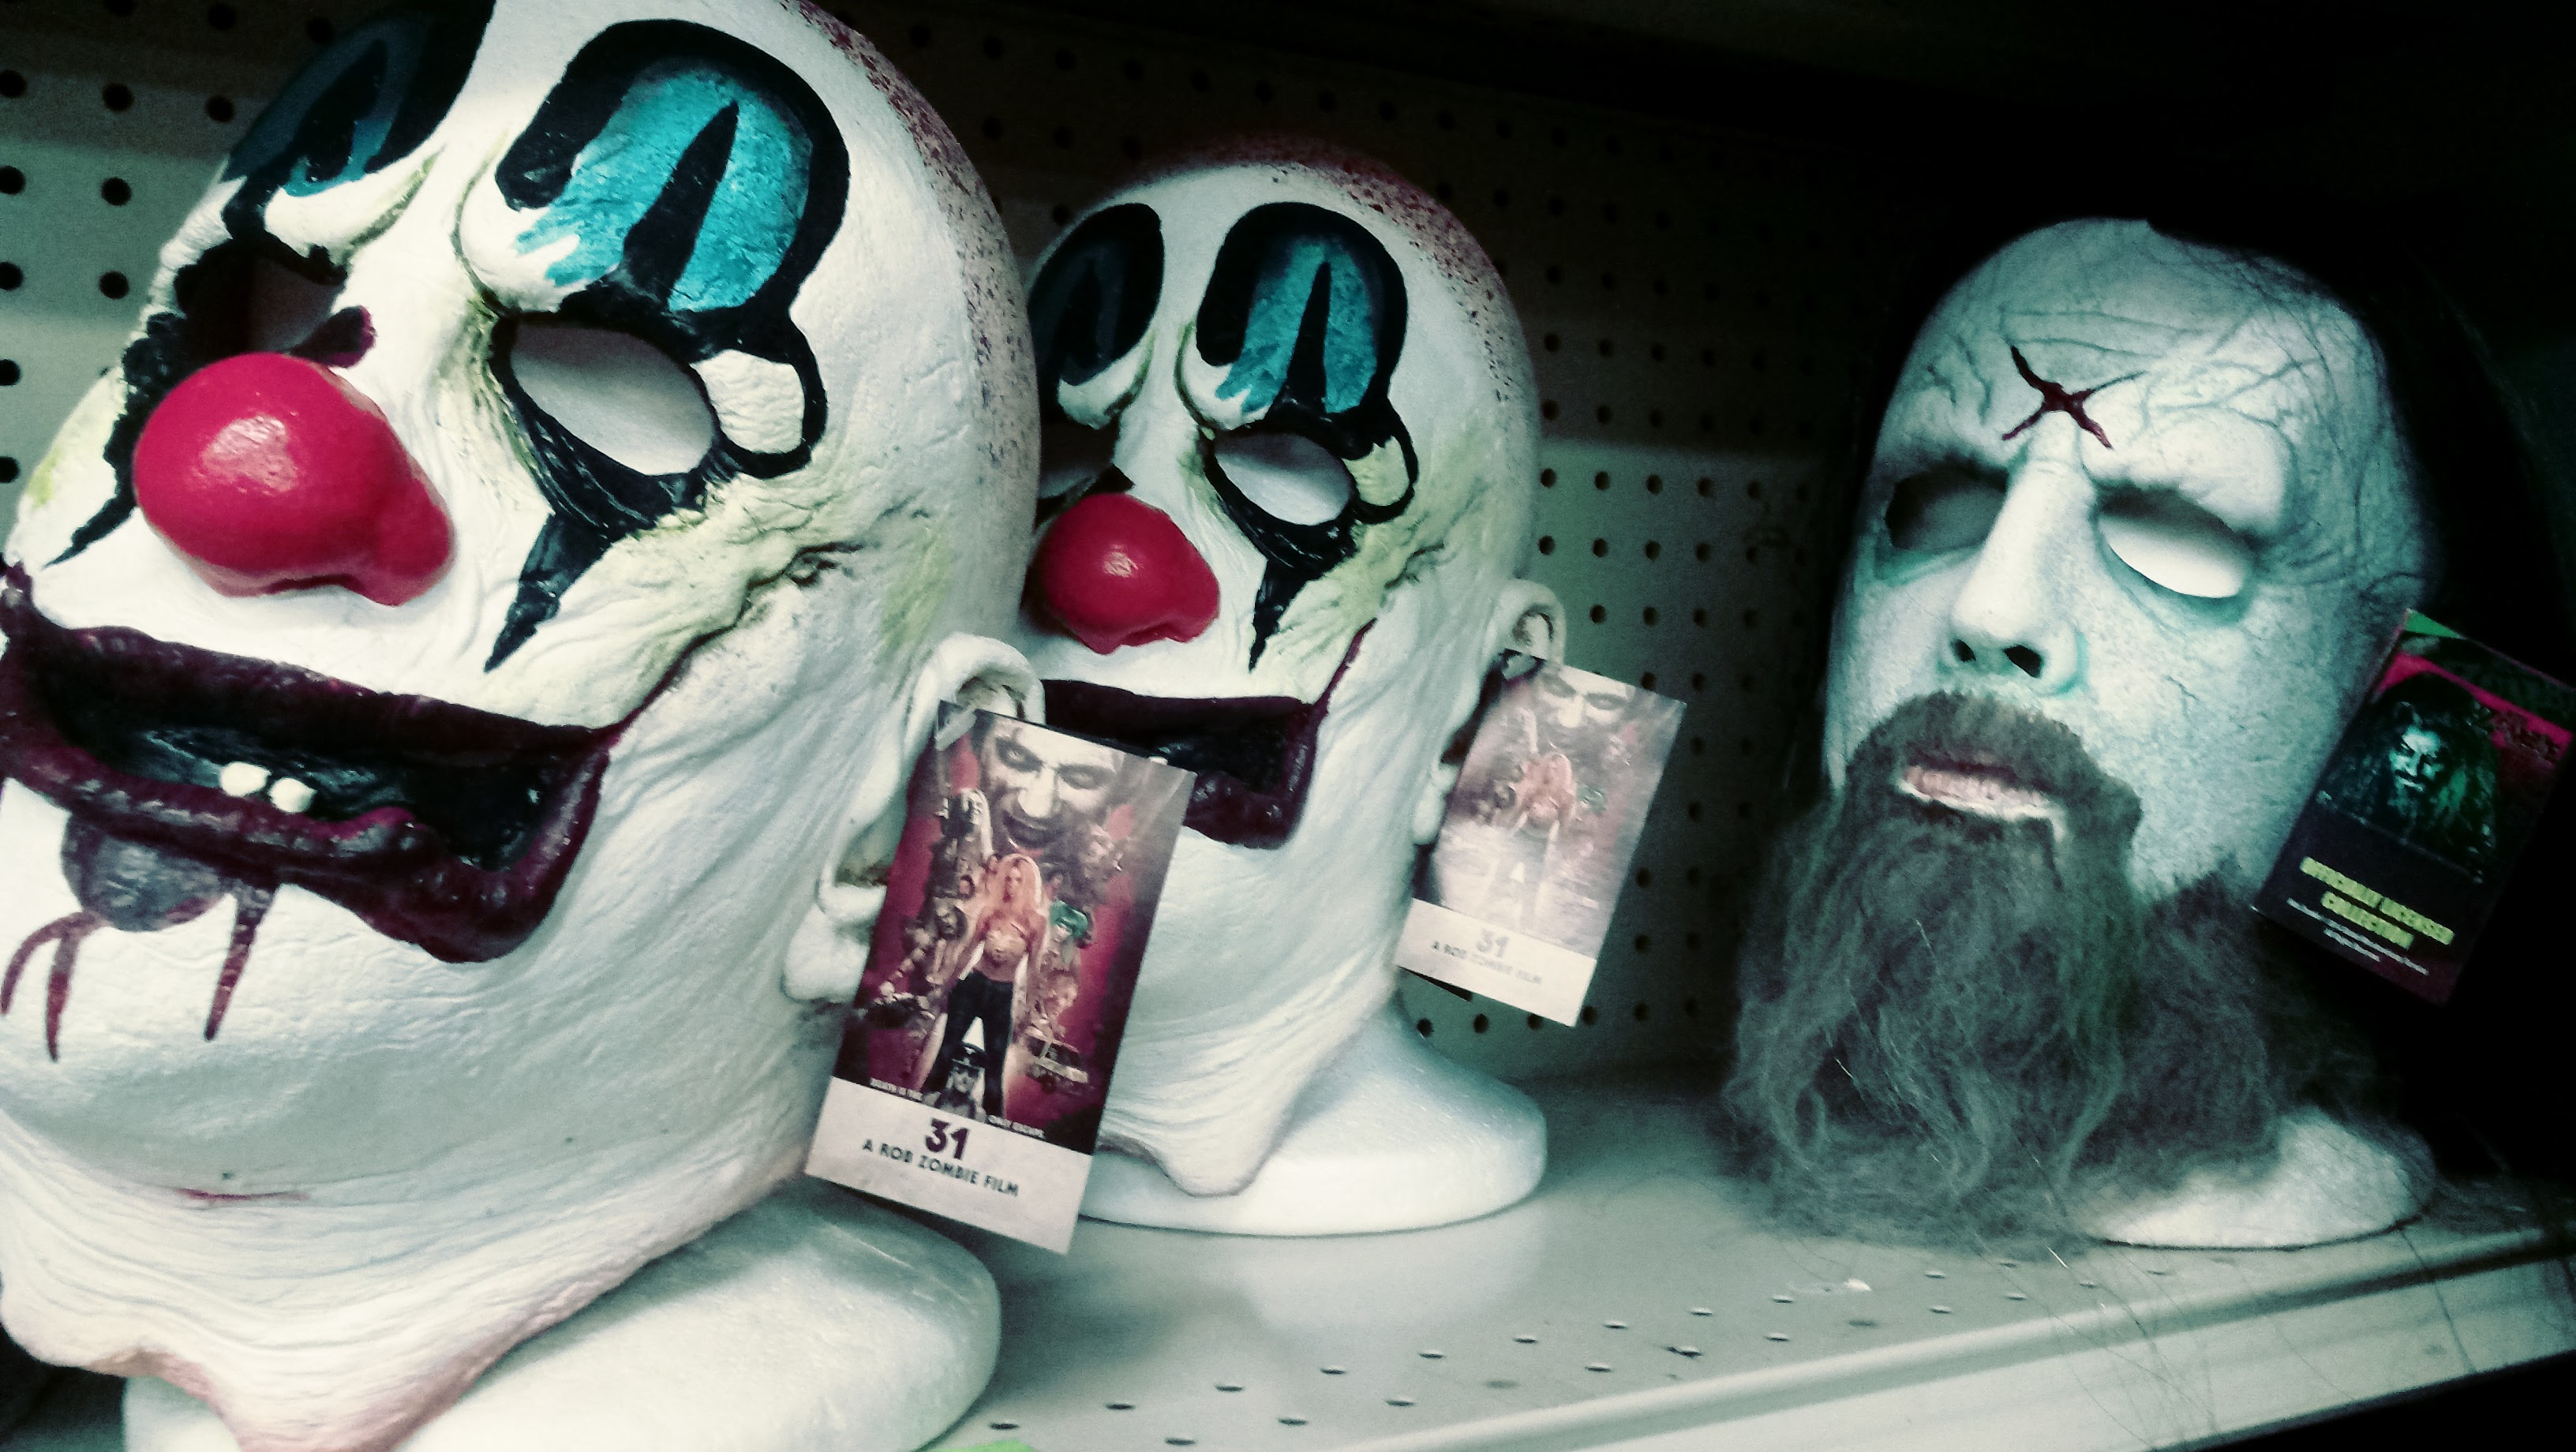 nick nackery rob zombie captain spaulding house of a thousand corpses dragula masks